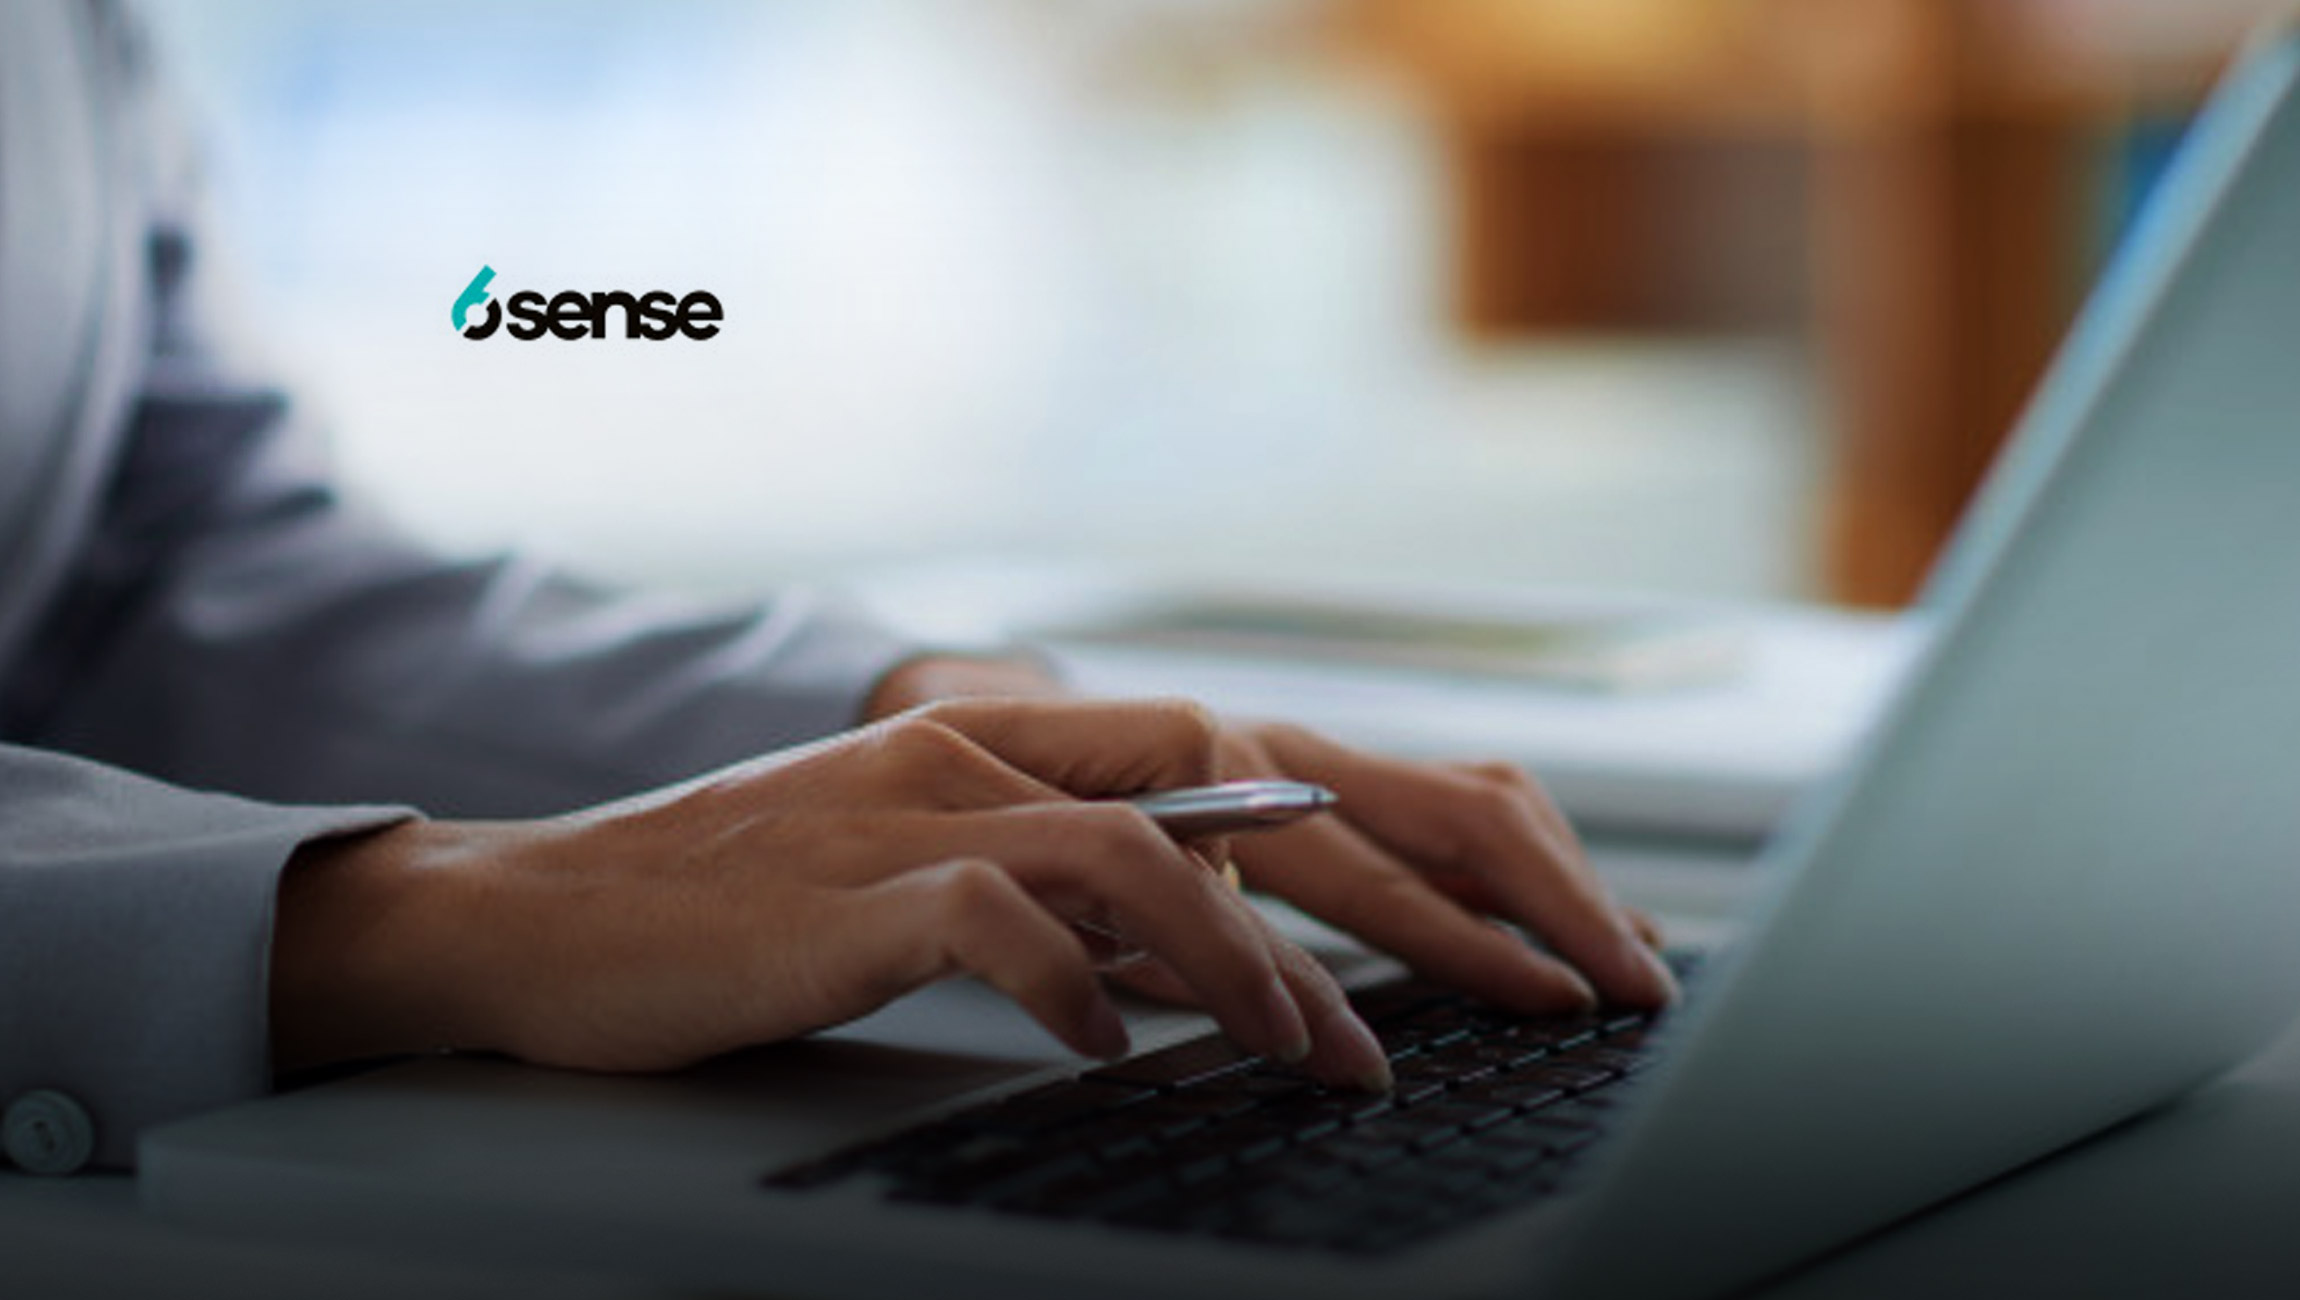 6sense Named a Leader in Account-Based Marketing Platforms